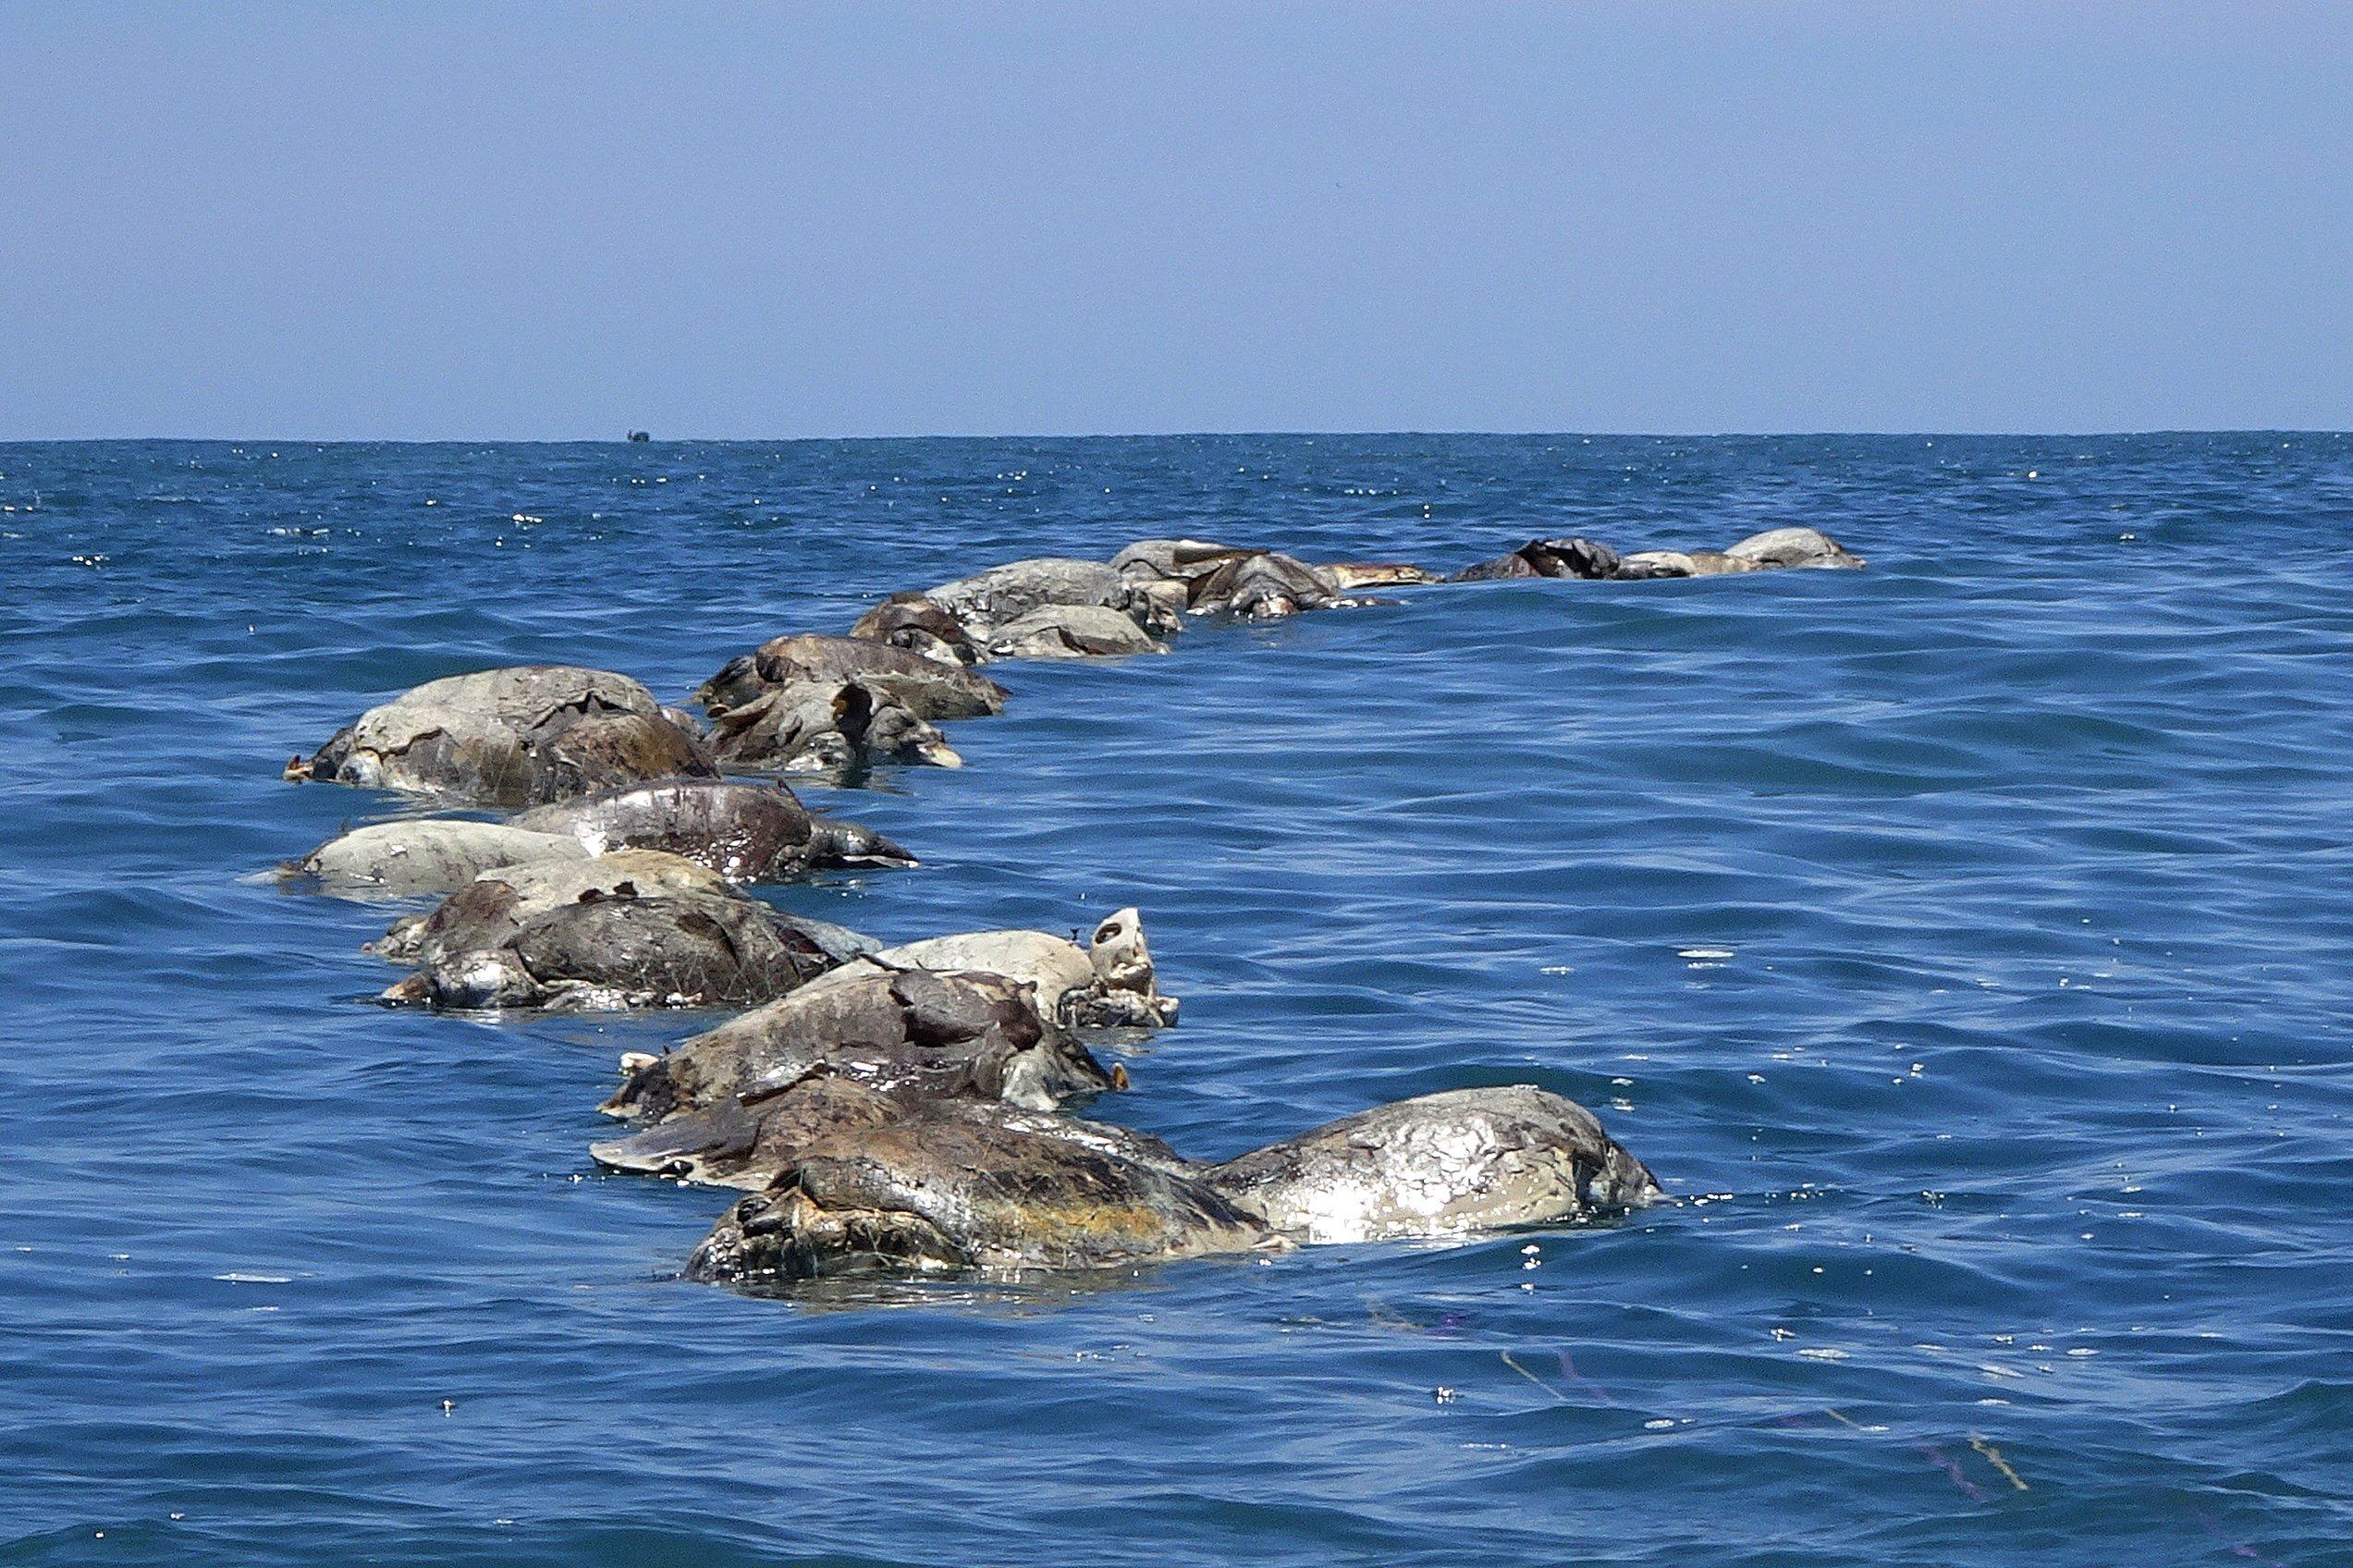 Over 350 Sea Turtles Died Off The Coast Of Baja California